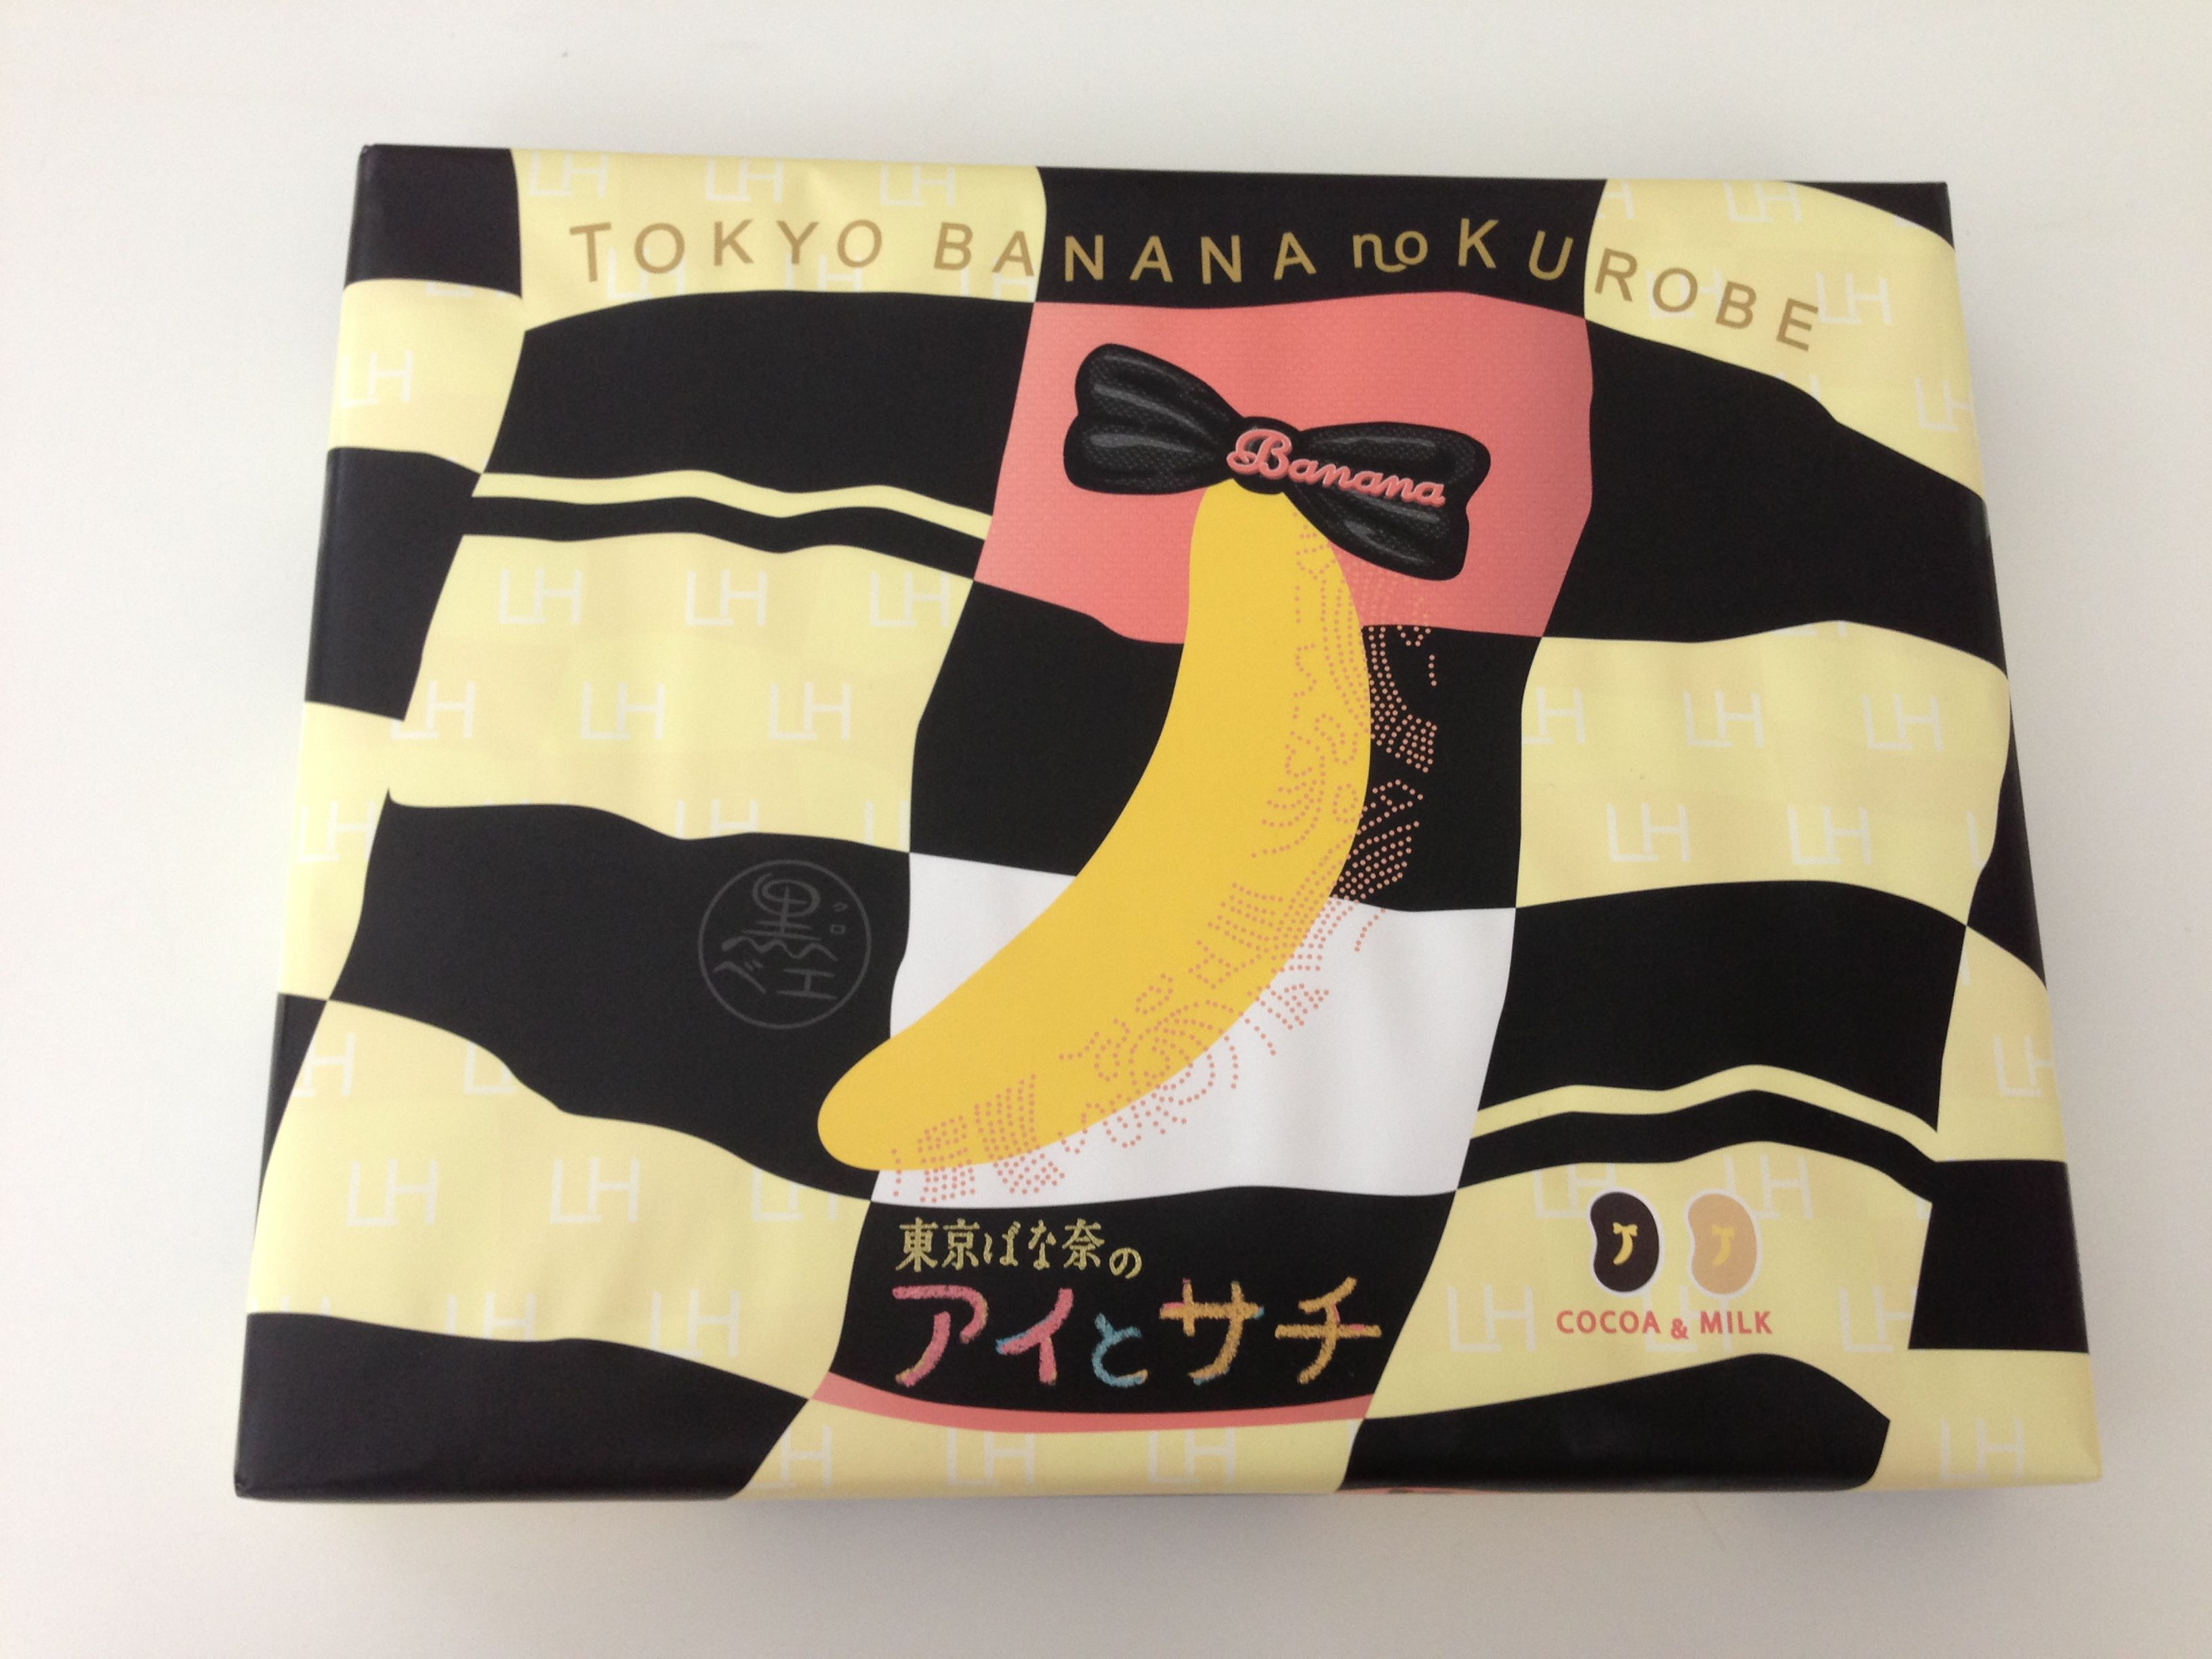 Another Tokyo Banana